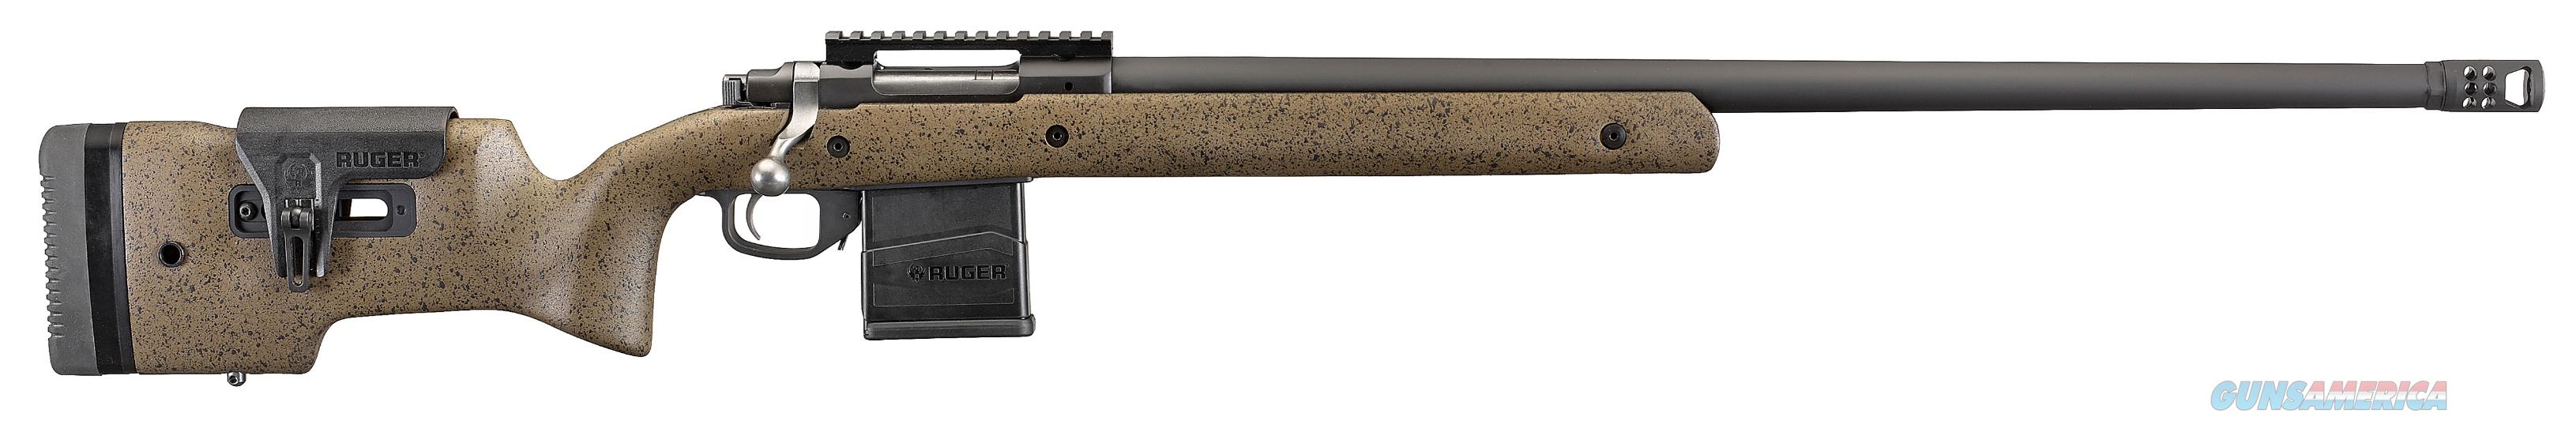 Ruger Hawkeye, Rug 57123 Hawkeye Lr Trgt  308   26 Mbspkbr-lam 10  Guns > Pistols > 1911 Pistol Copies (non-Colt)